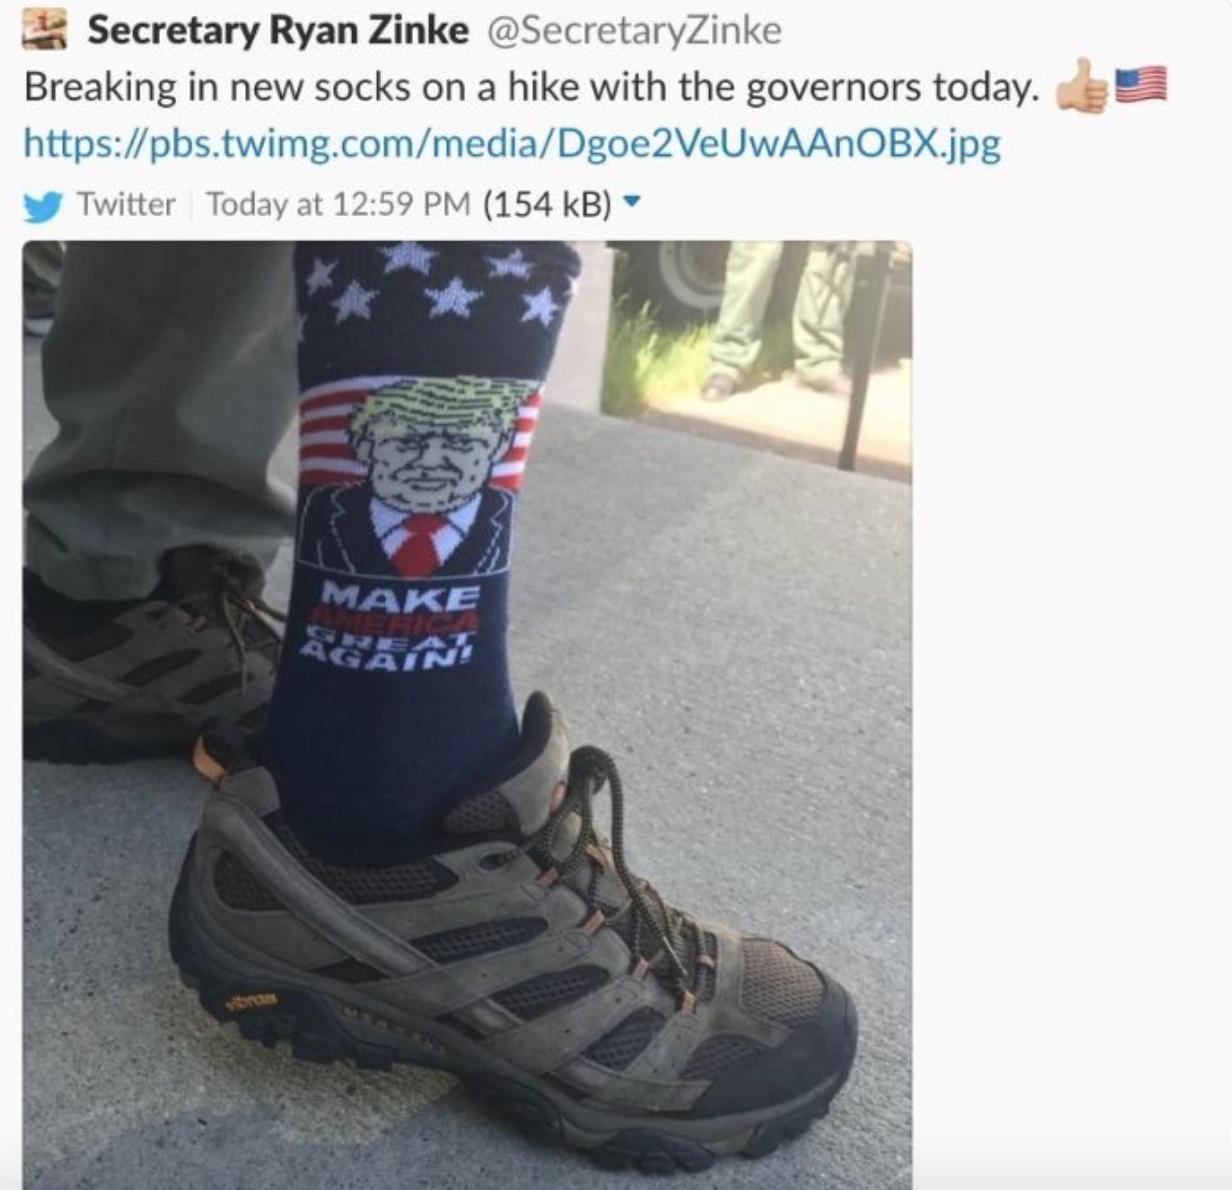 Ryan Zinke's Tweet Showing His MAGA Socks